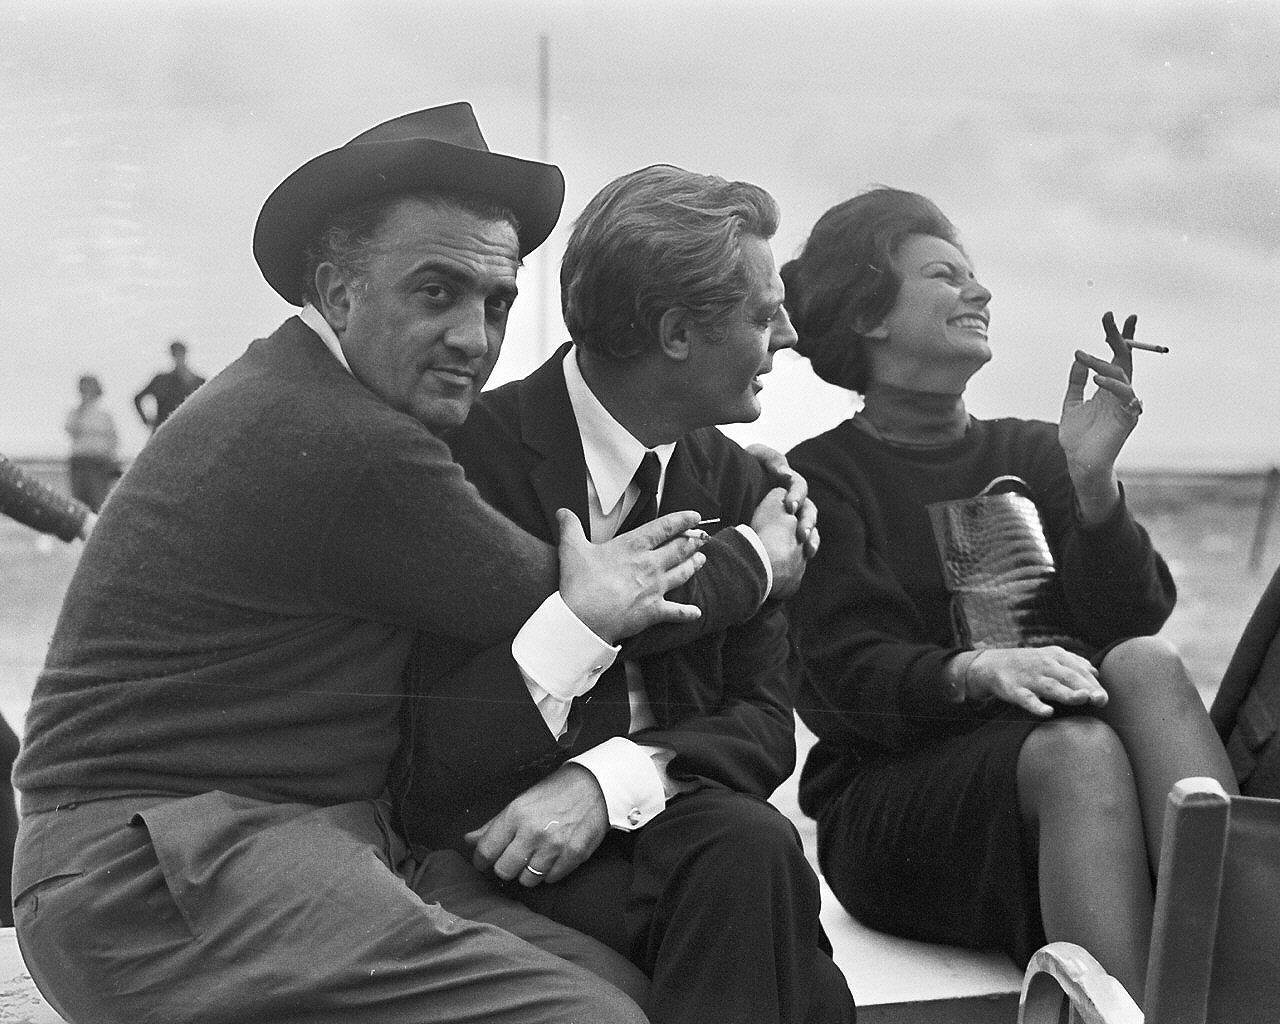 Federico Fellini photo 6 of 14 pics wallpaper   photo 340989 1280x1024